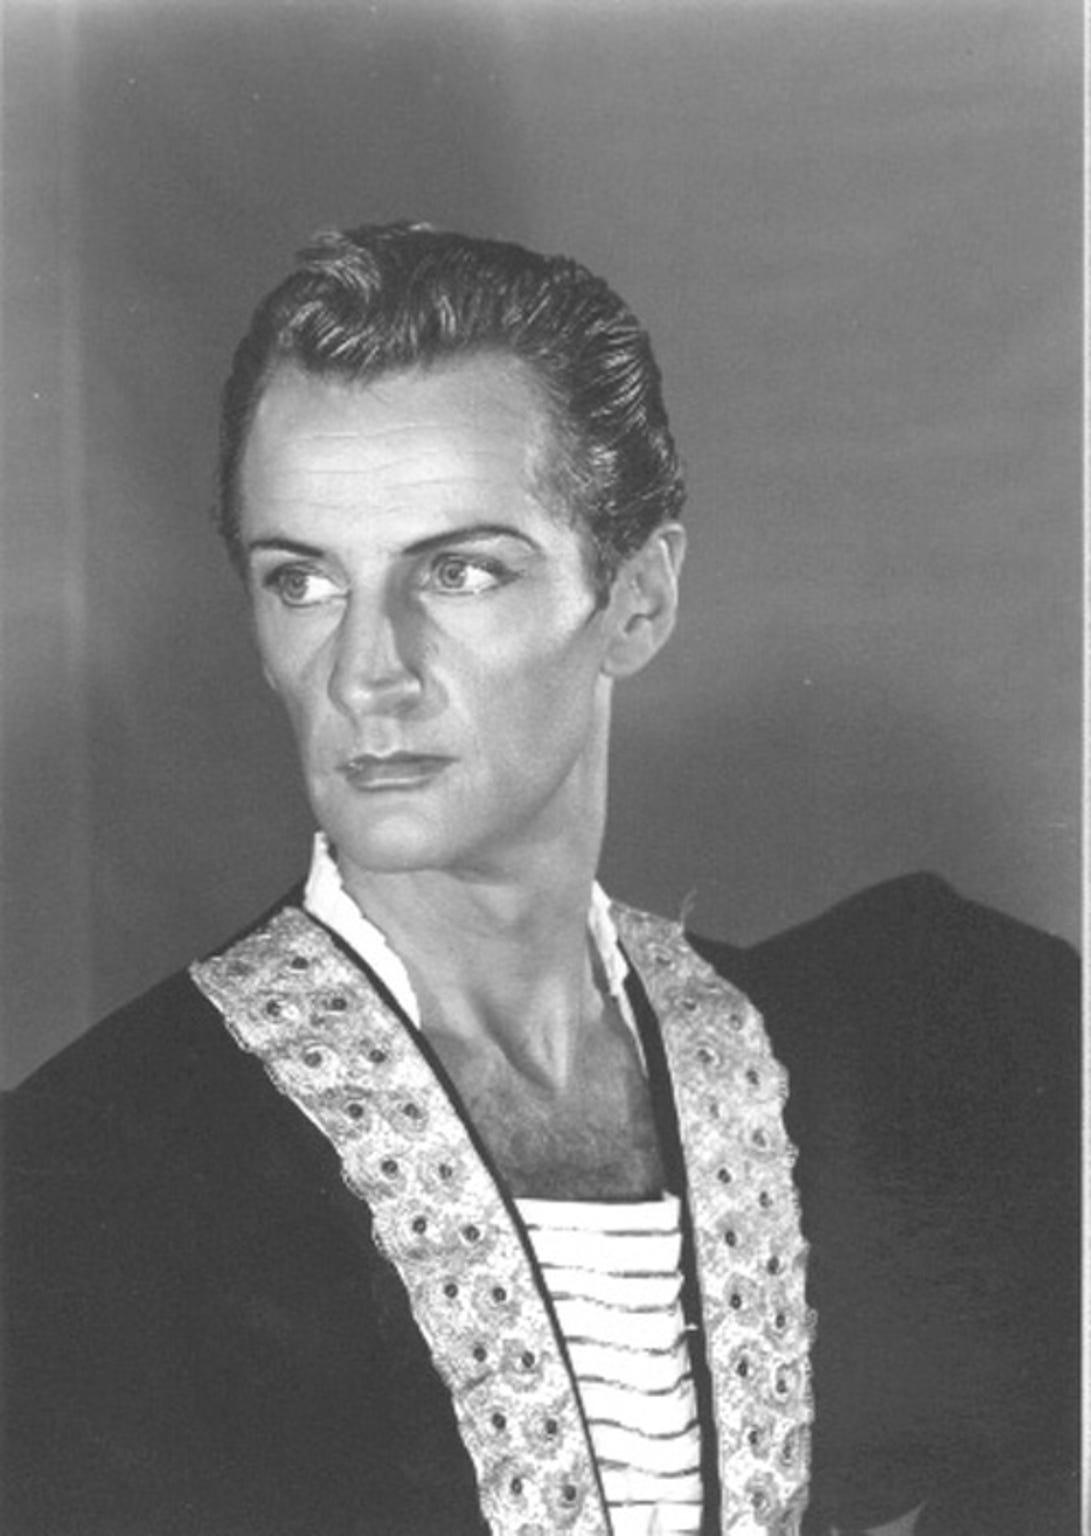 Dancer Henry Danton in an early publicity still.